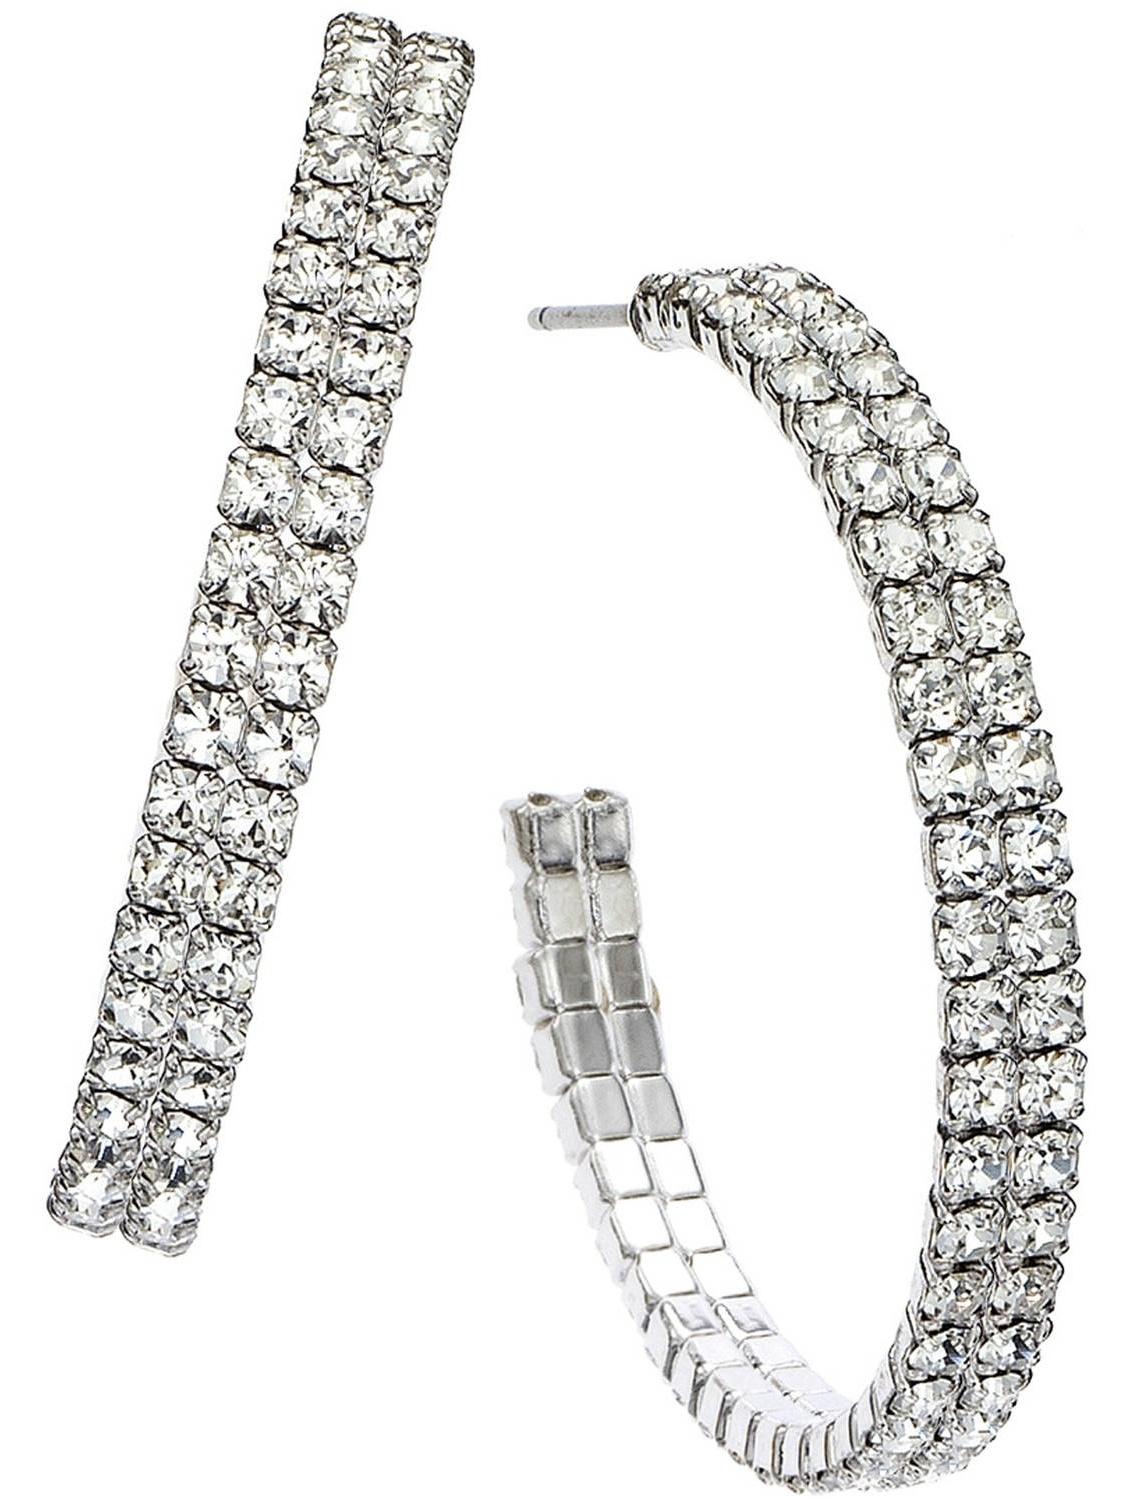 X & O Handset Austrian Crystal Rhodium-Plated Double-Row 35mm Hoop Earrings